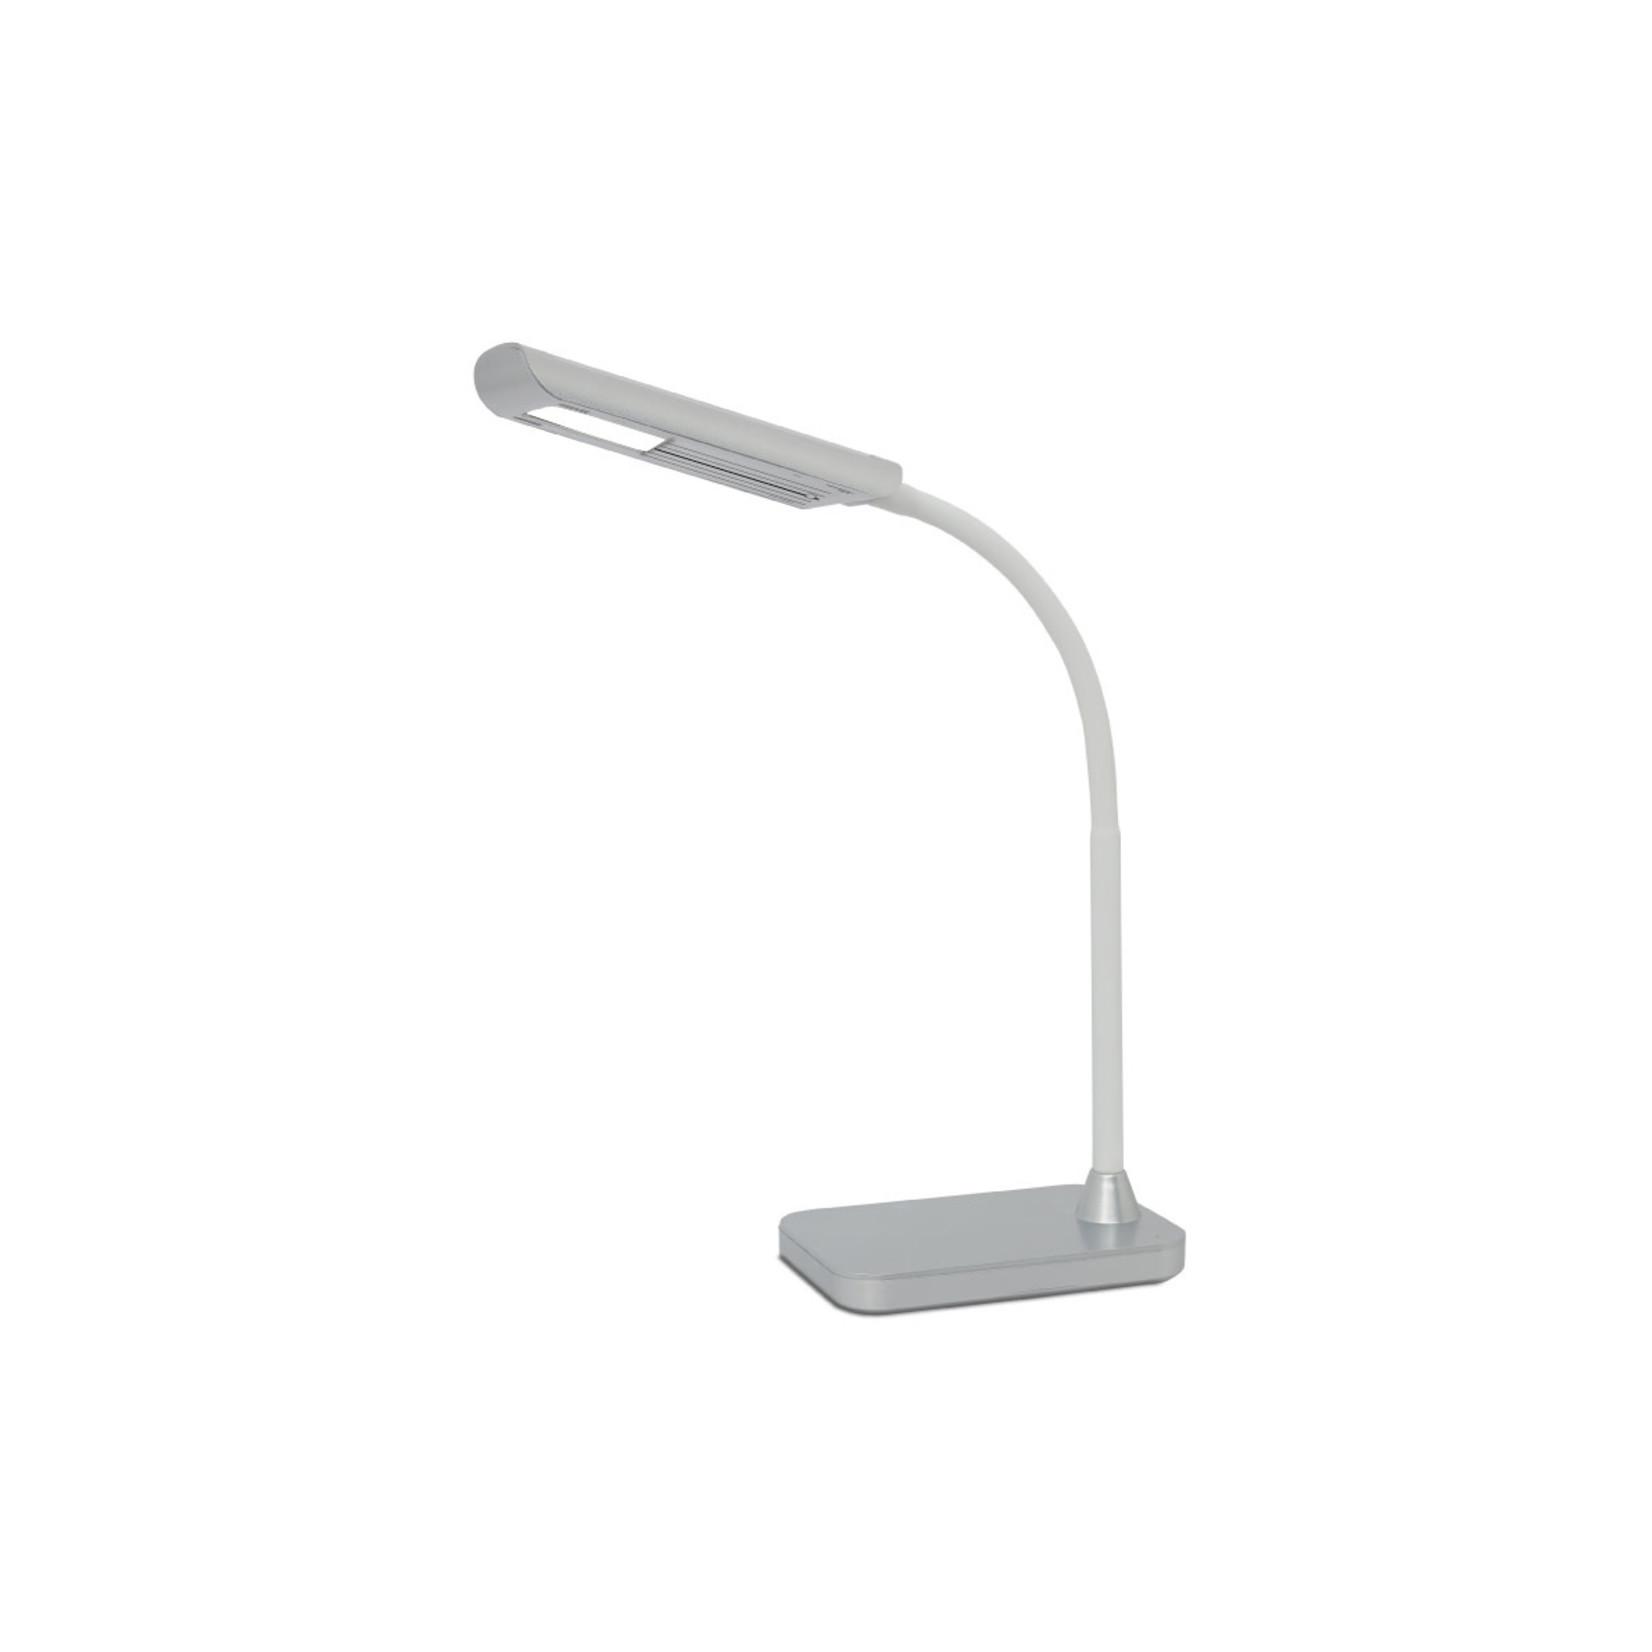 Shabbos Solution Or Li Shabbat Lamp - Universal Model